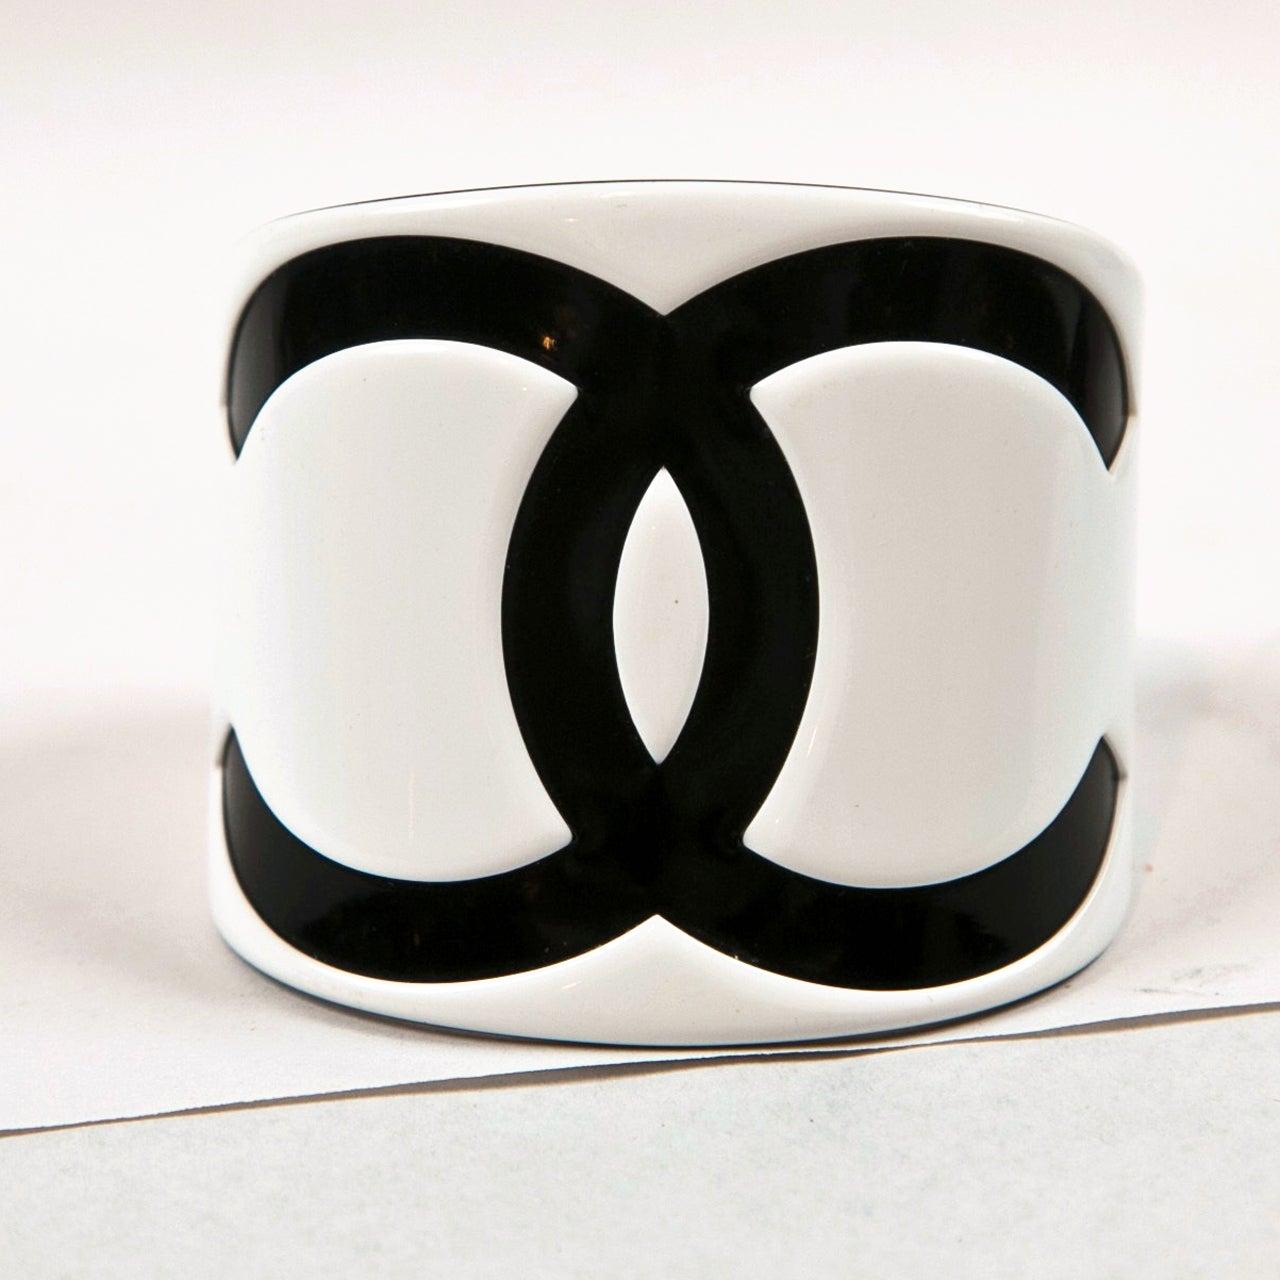 Chanel Resin Cuff image 6